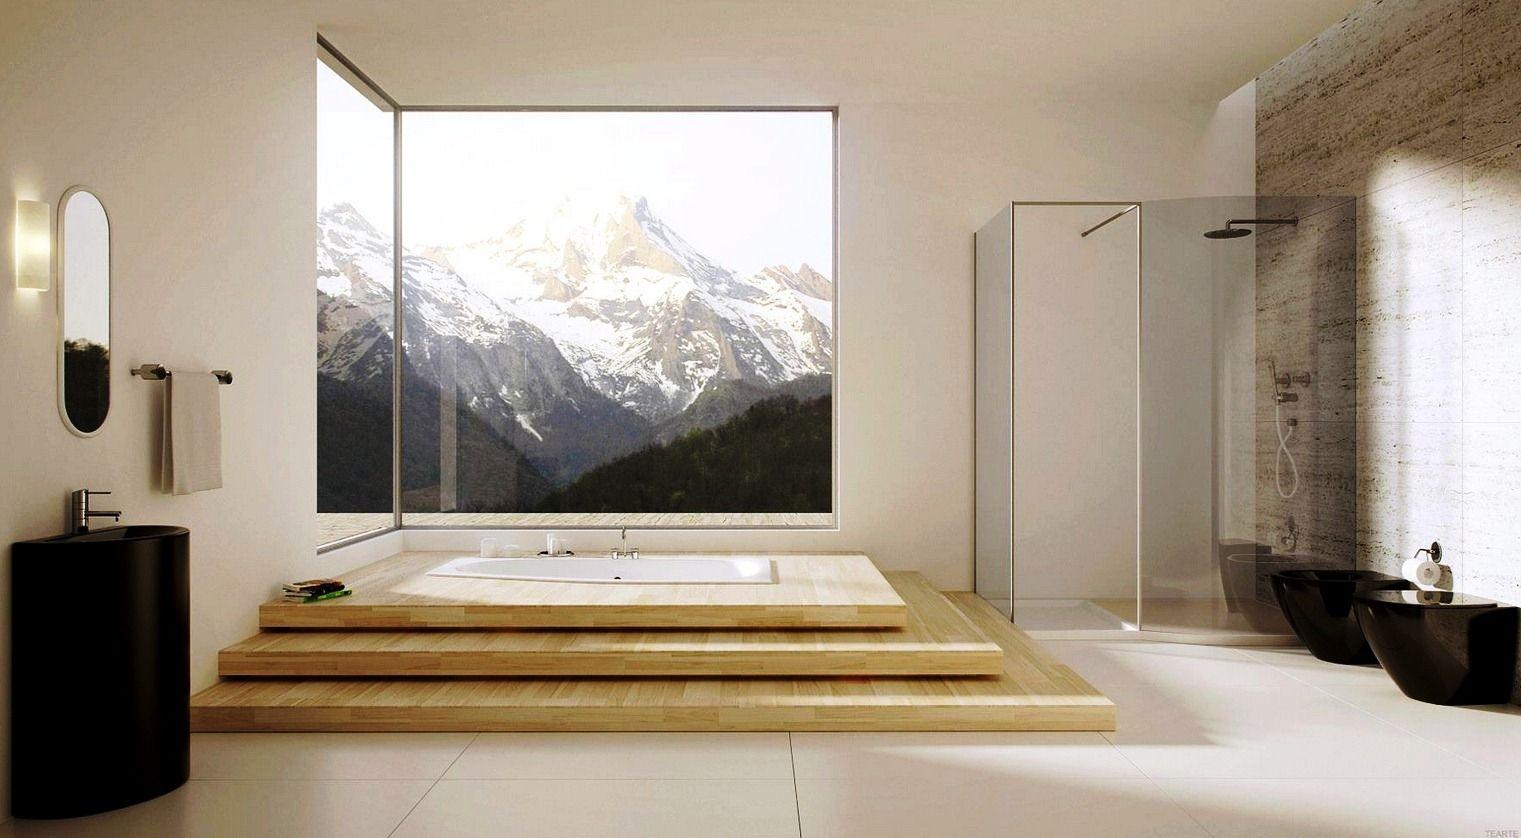 Simply Modern Bathroom Idea With Unique Drop-in Tub In Three Levels ...